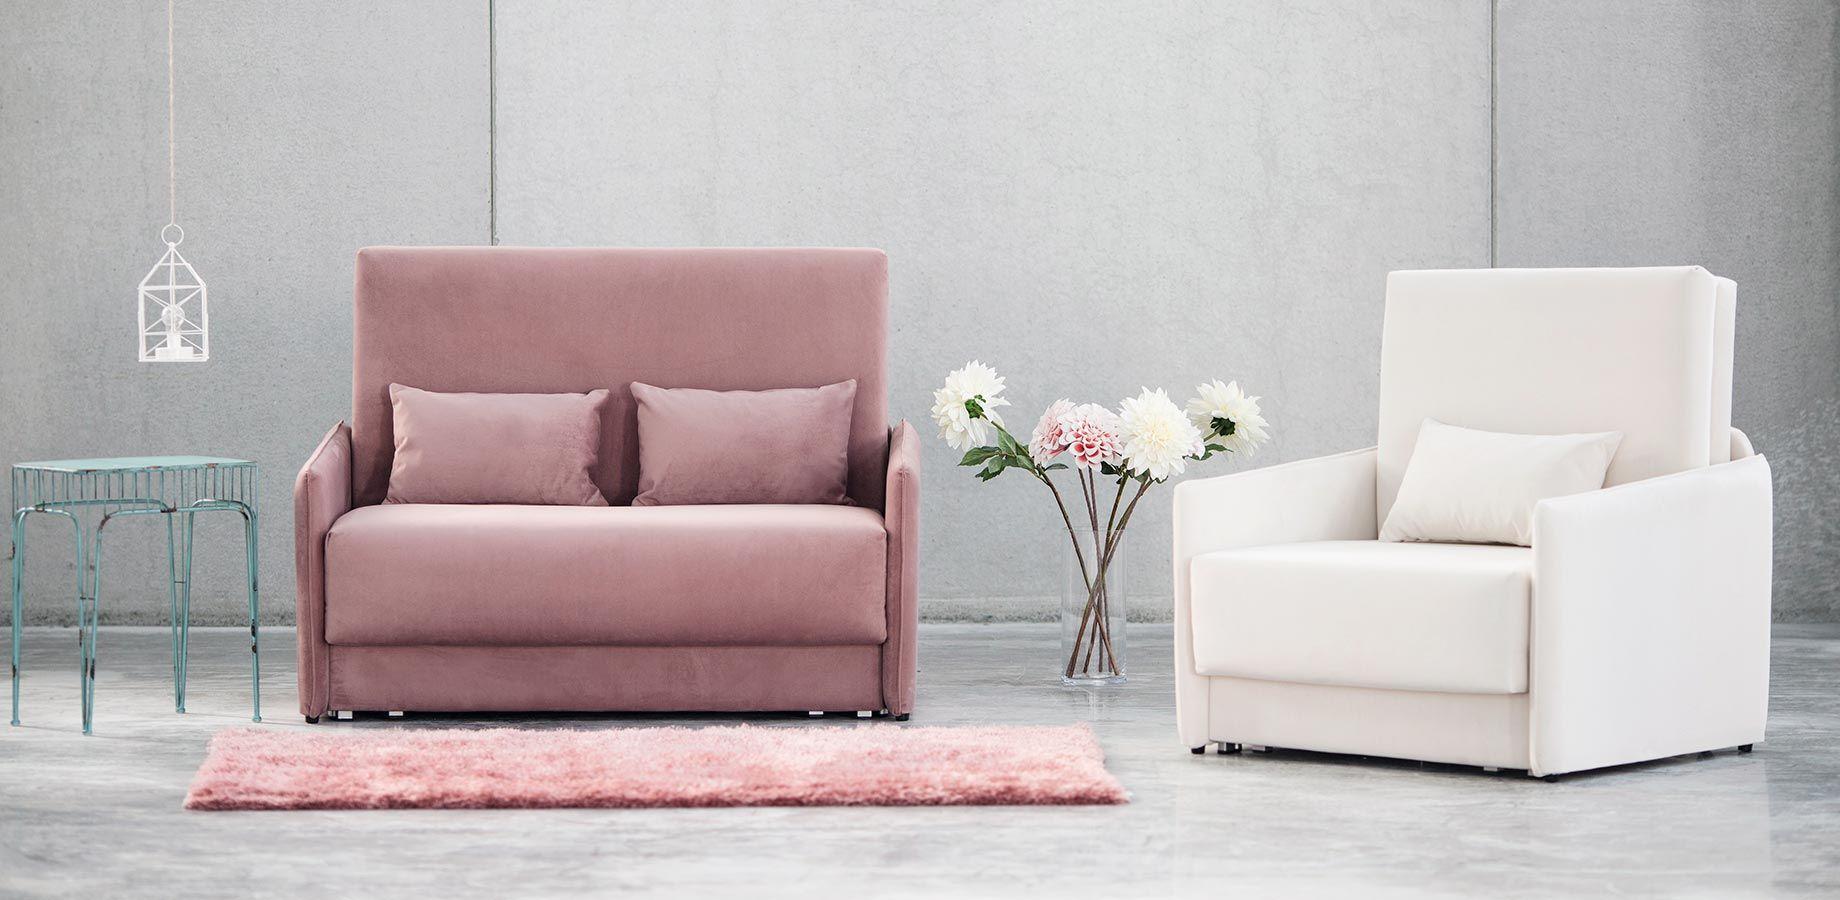 Muebles baratos Aluche